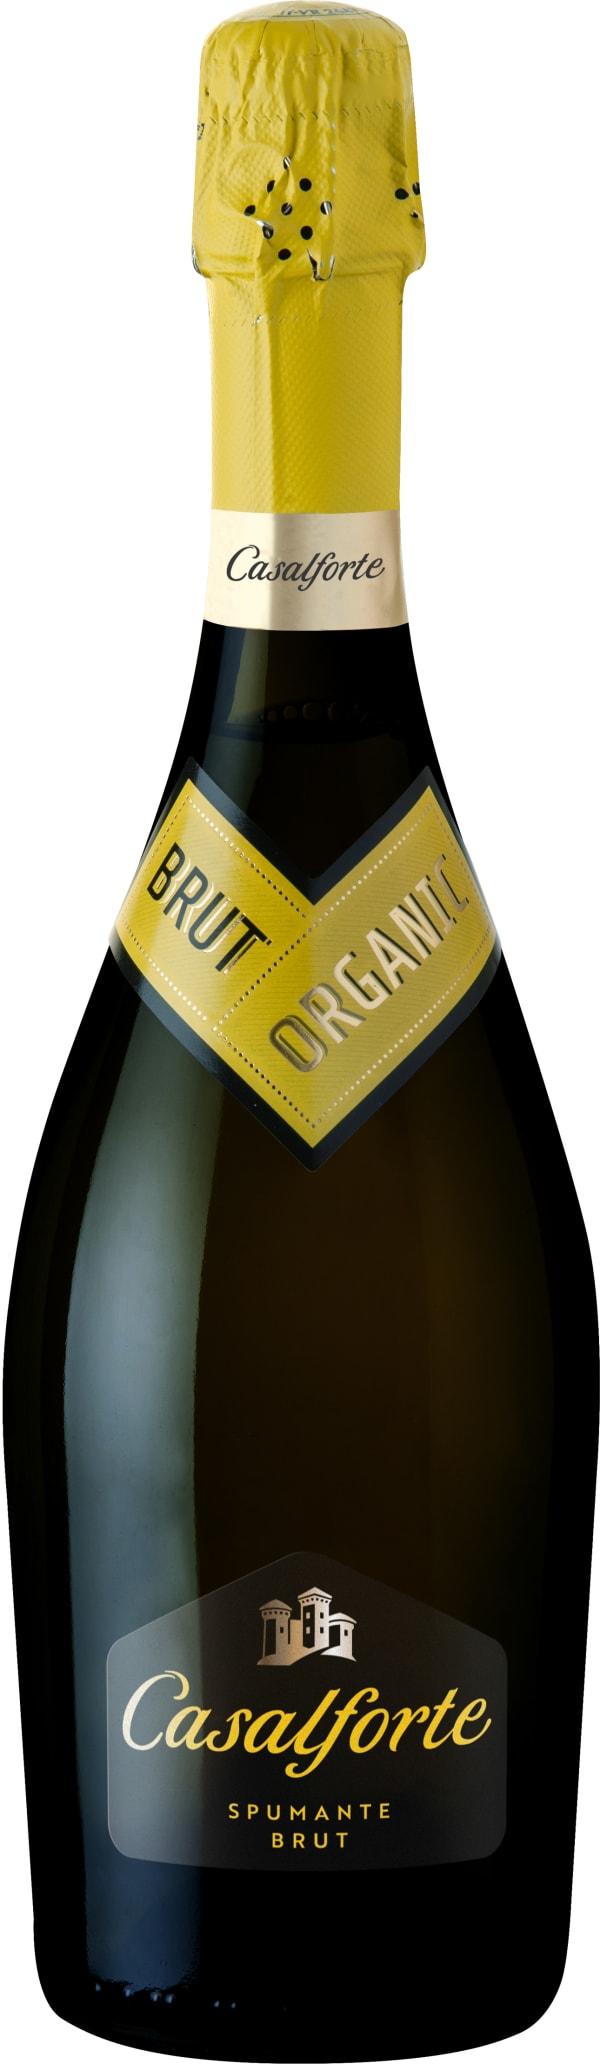 Casalforte Organic Brut